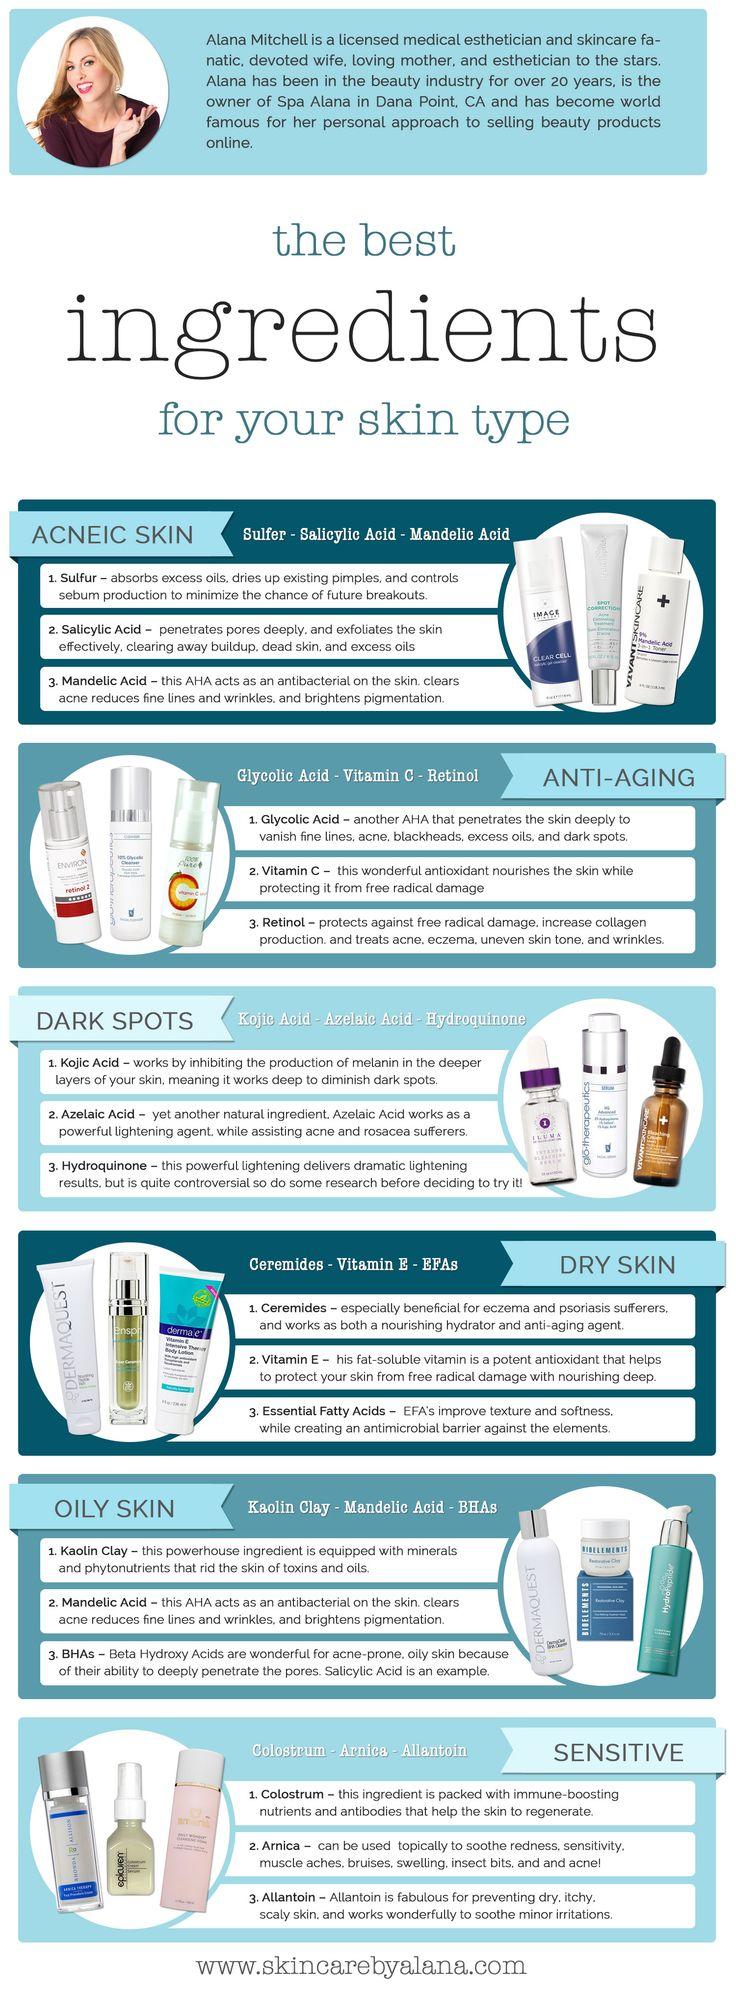 SKINCARE BY ALANA | SKINCARE INGREDIENTS FOR YOUR SKIN TYPES | EPICUREN | RHONDA ALLISON | IMAGE SKINCARE | GLO MINERALS | BIOELEMENTS | AHA | BHA | EFA | CEREMIDES | MANDELIC ACID | AZELAIC ACID | SALICYLIC ACID | KOJIC ACID | ARNICA | GLYCOLIC ACID | RETINOL | VITAMIN C | COLOSTRUC | ALLANTOIN